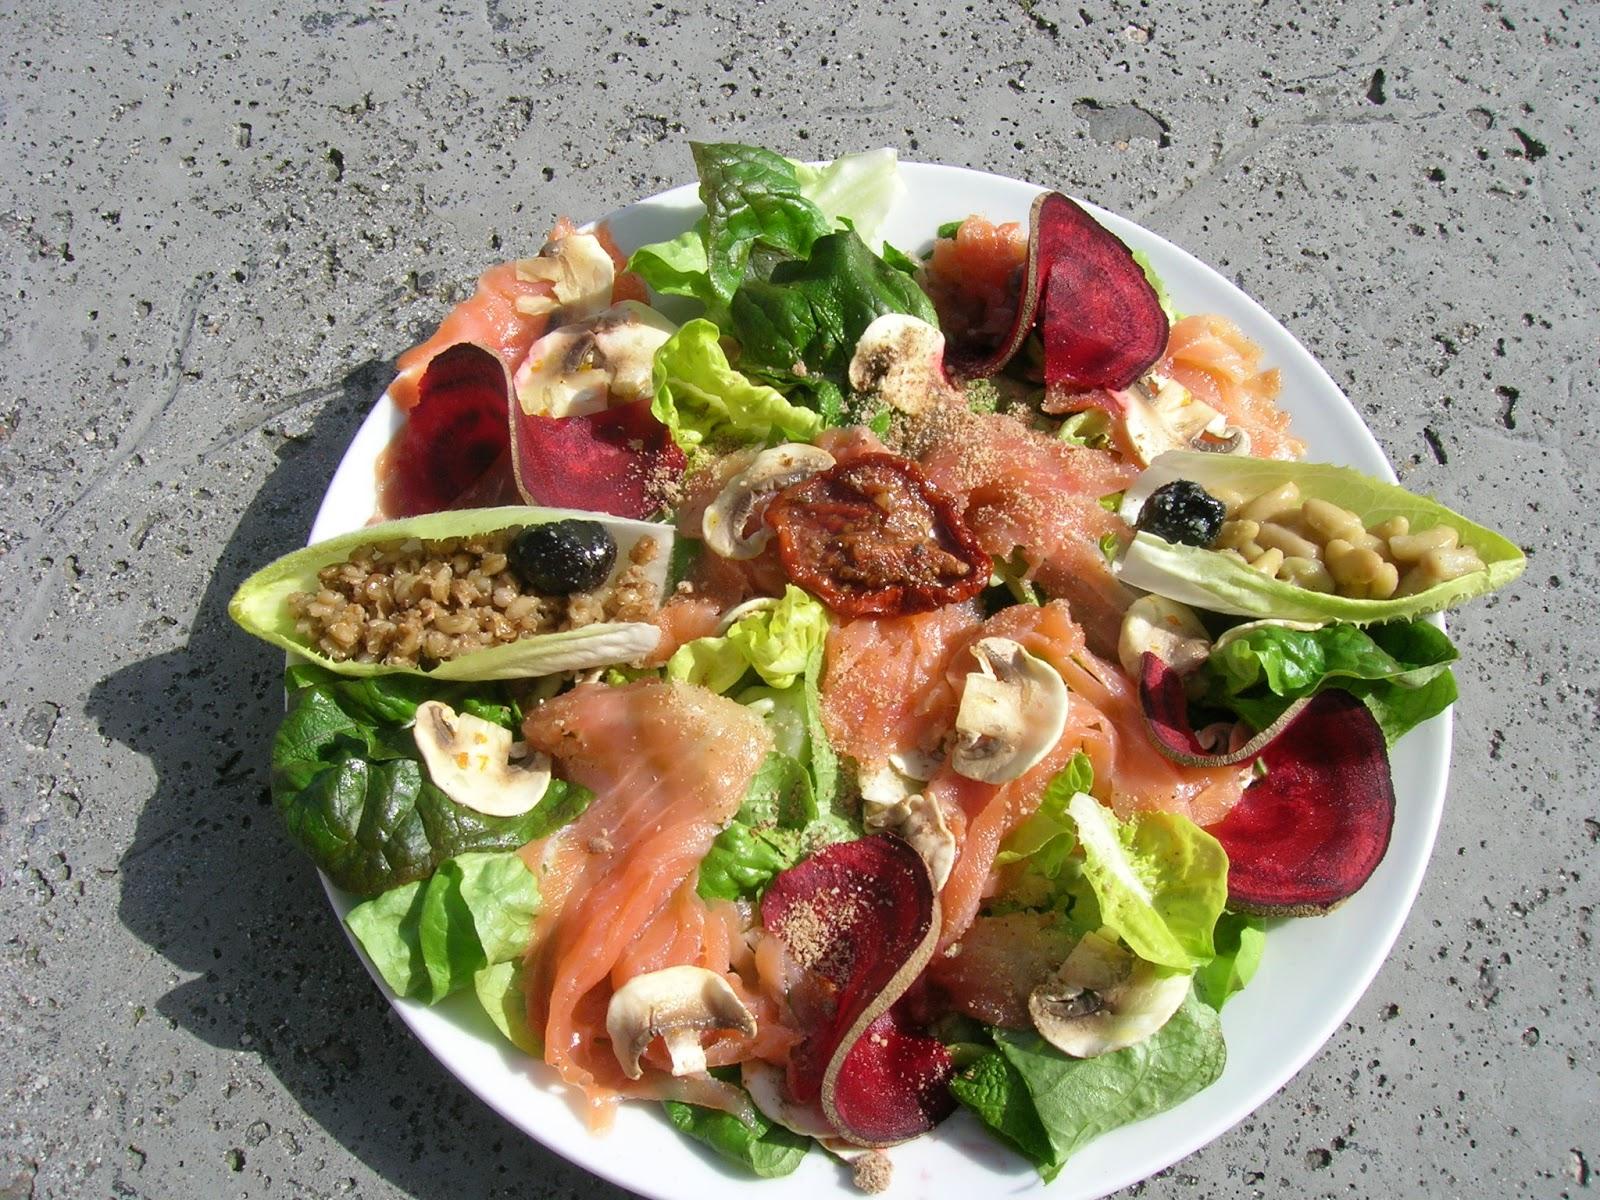 Maigrir avec la m thode montignac phase 1 menus bas ig du samedi 16 mars 2013 - Salade d hiver variete ...